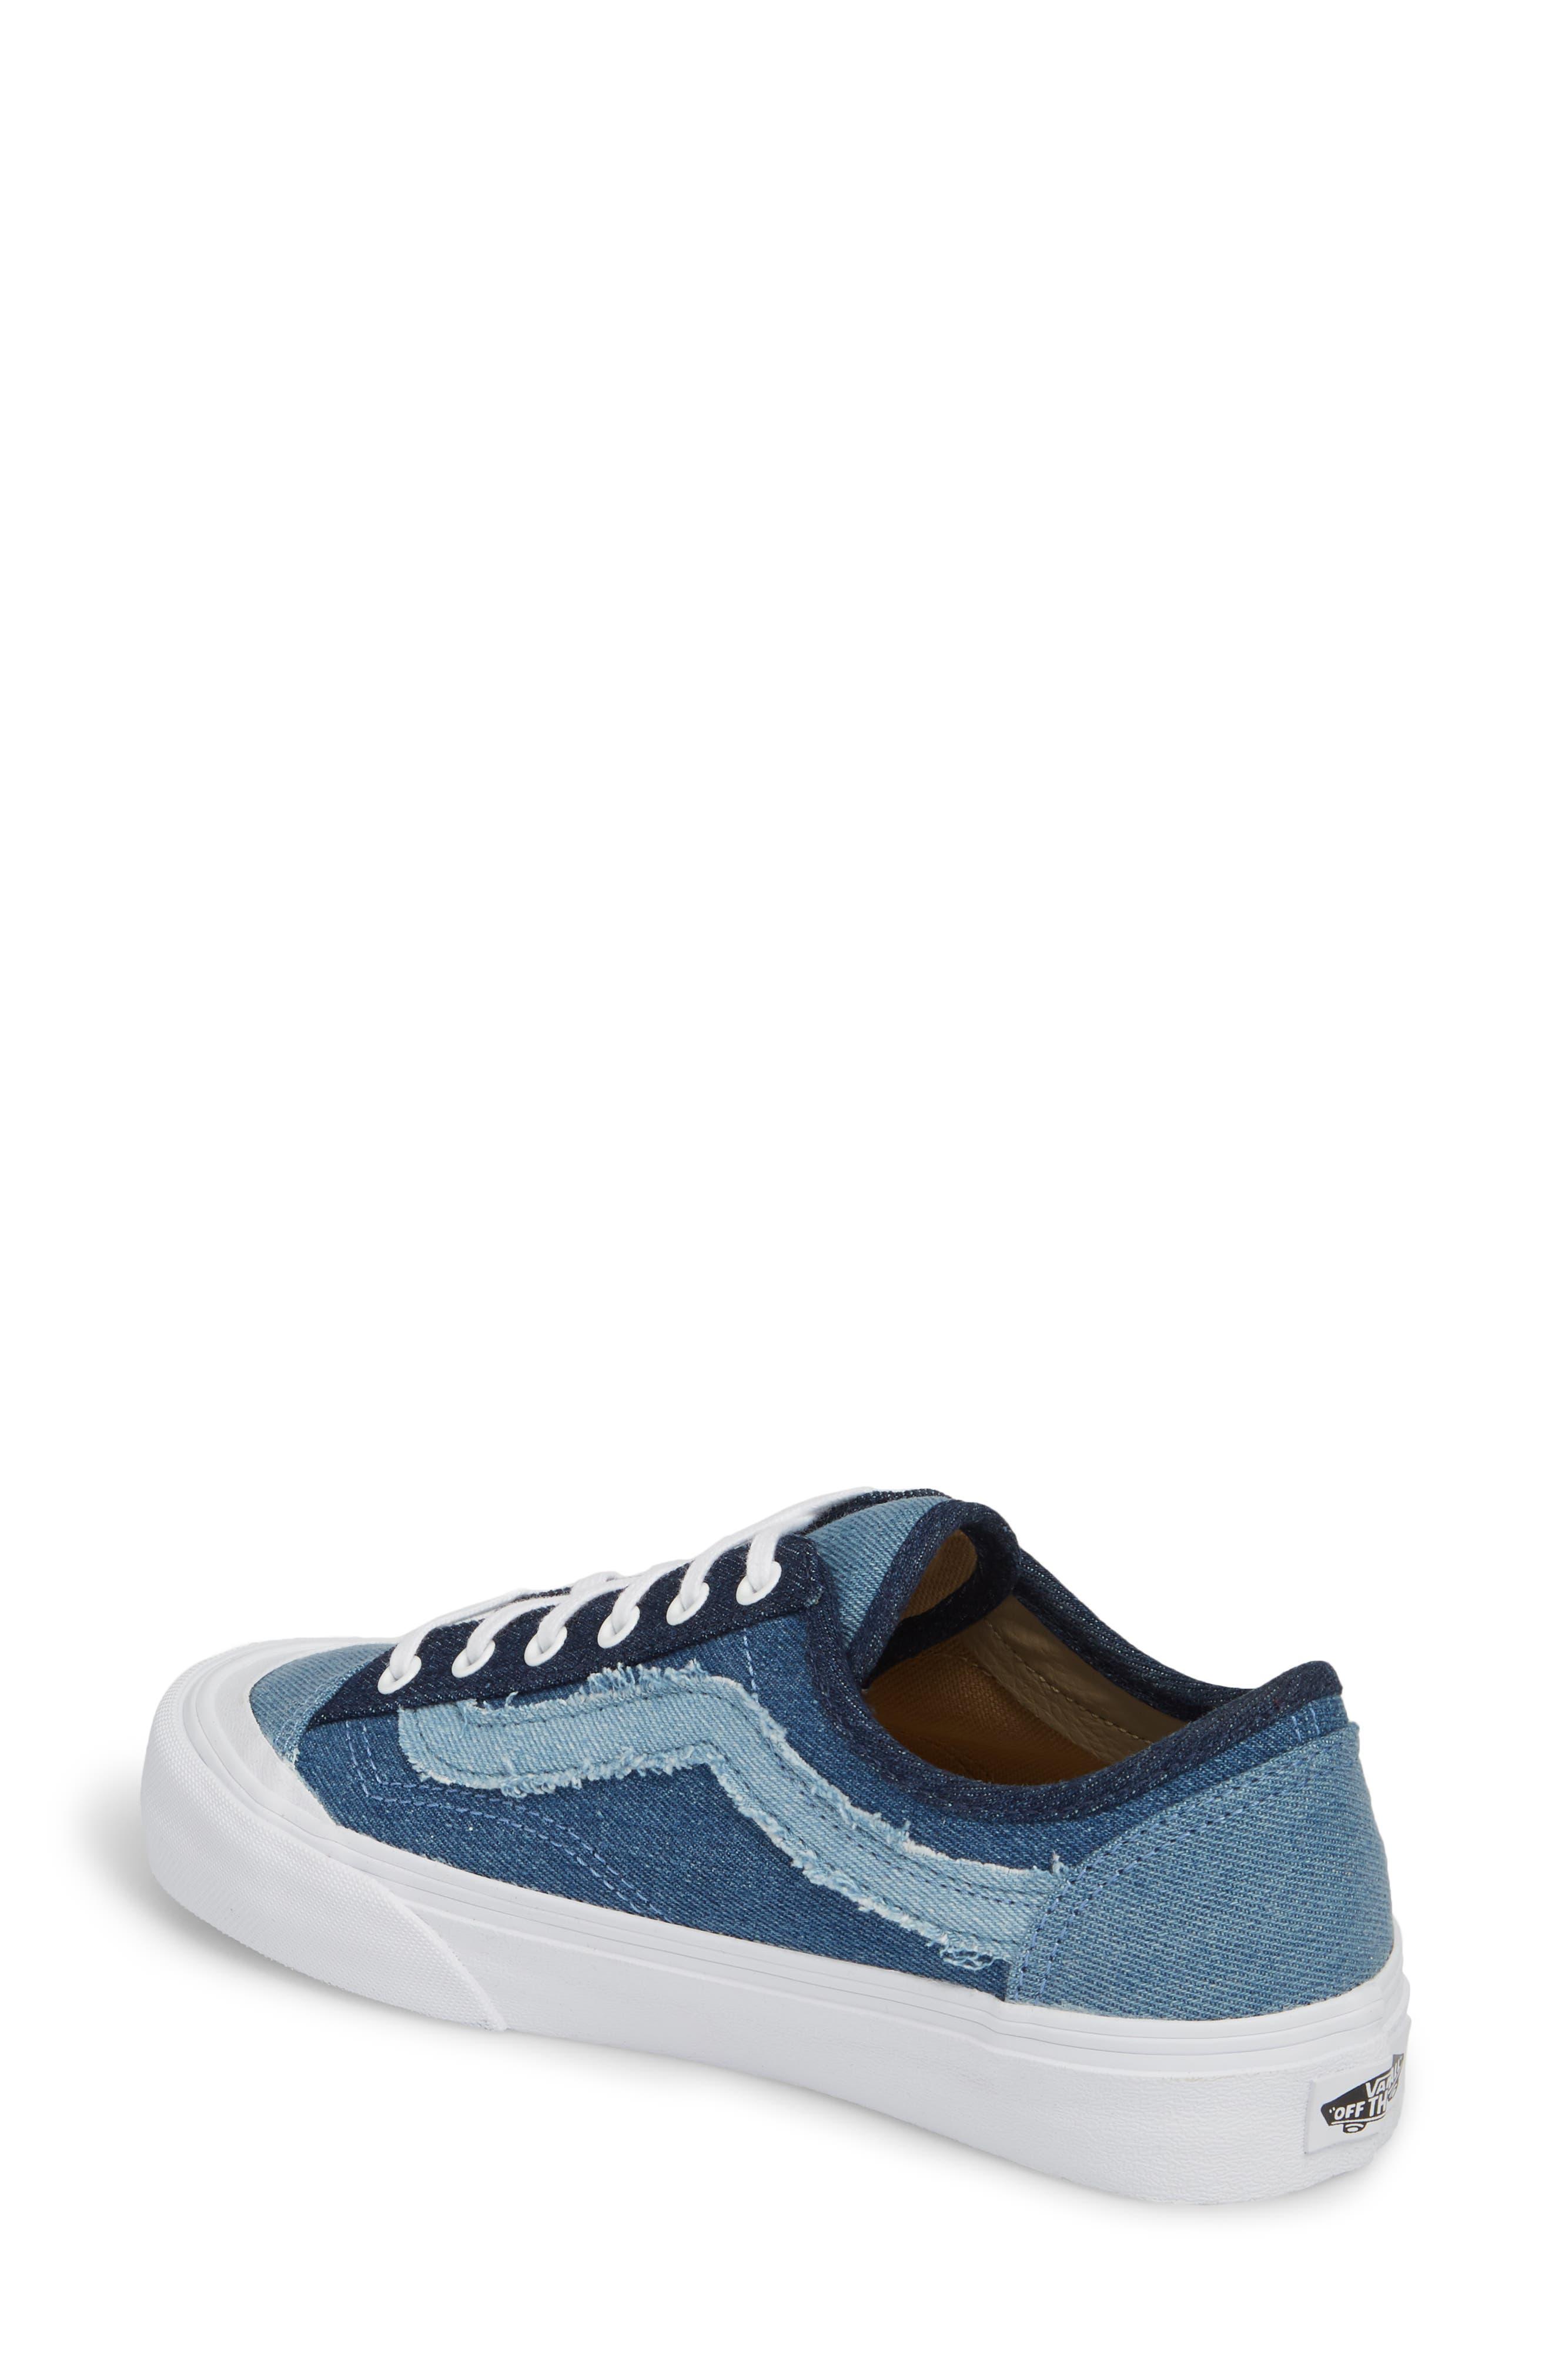 Style 36 Decon Sneaker,                             Alternate thumbnail 2, color,                             Frayed Denim